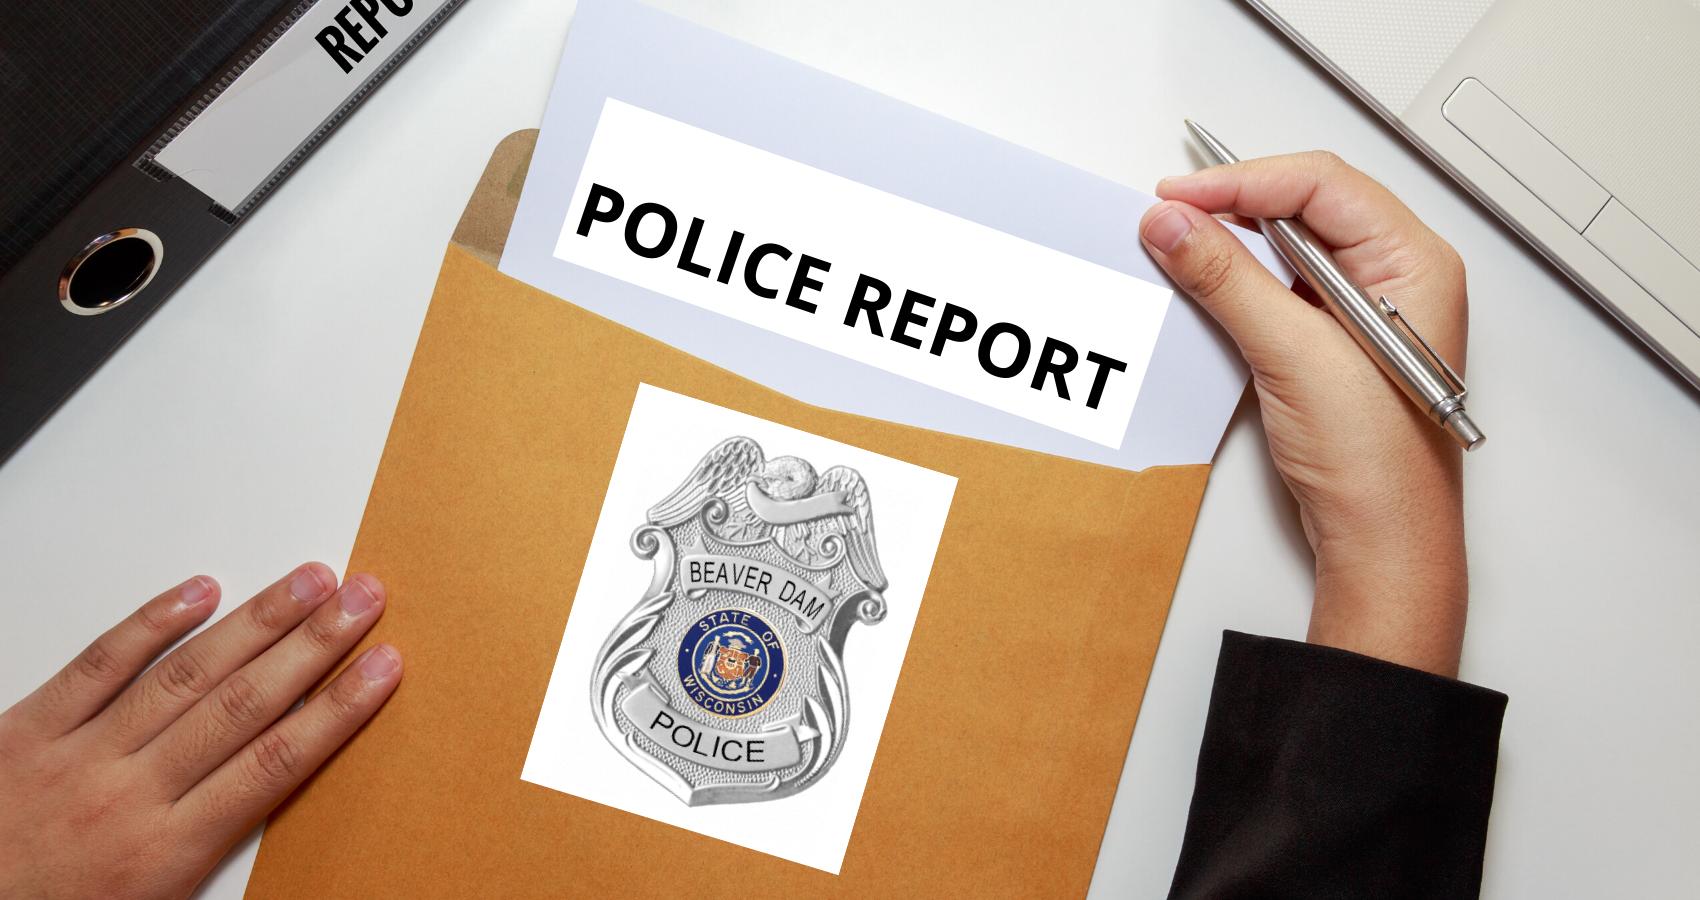 File a Police Report